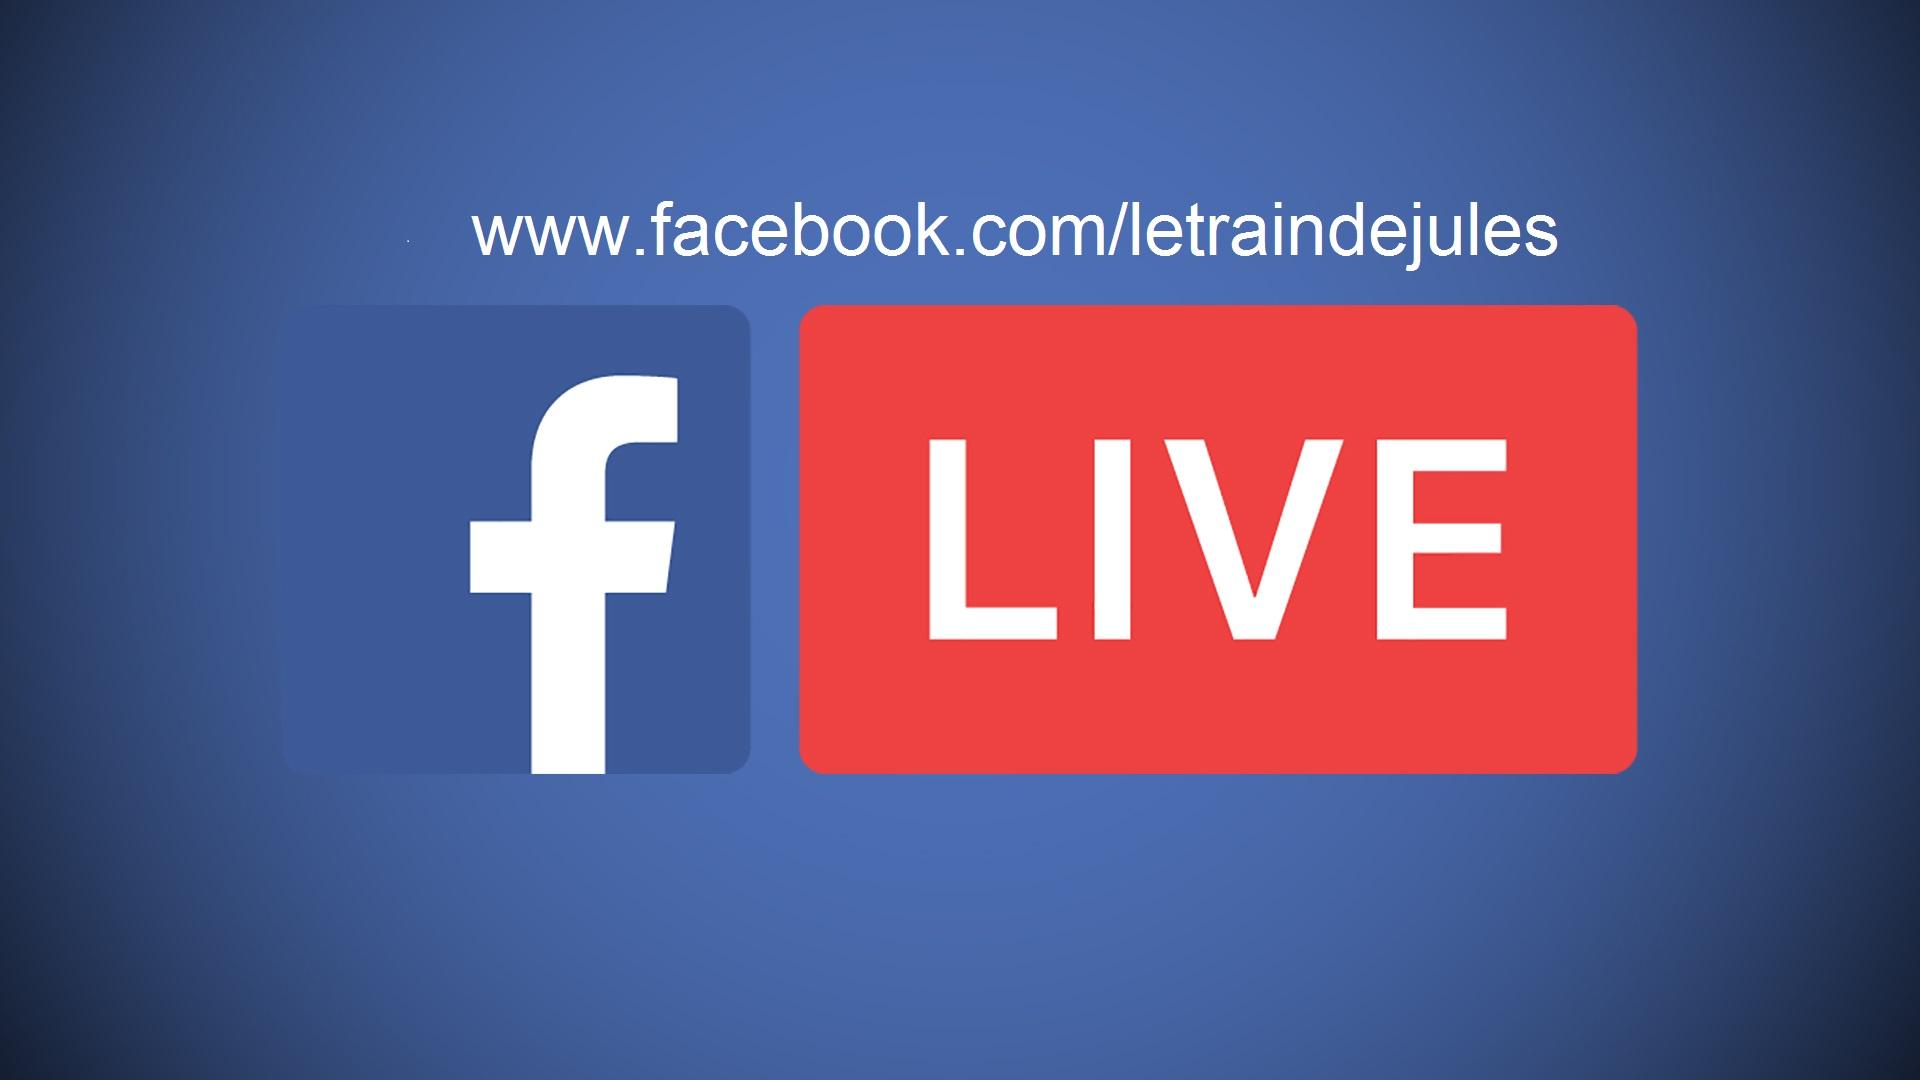 facebook live logo letraindejules